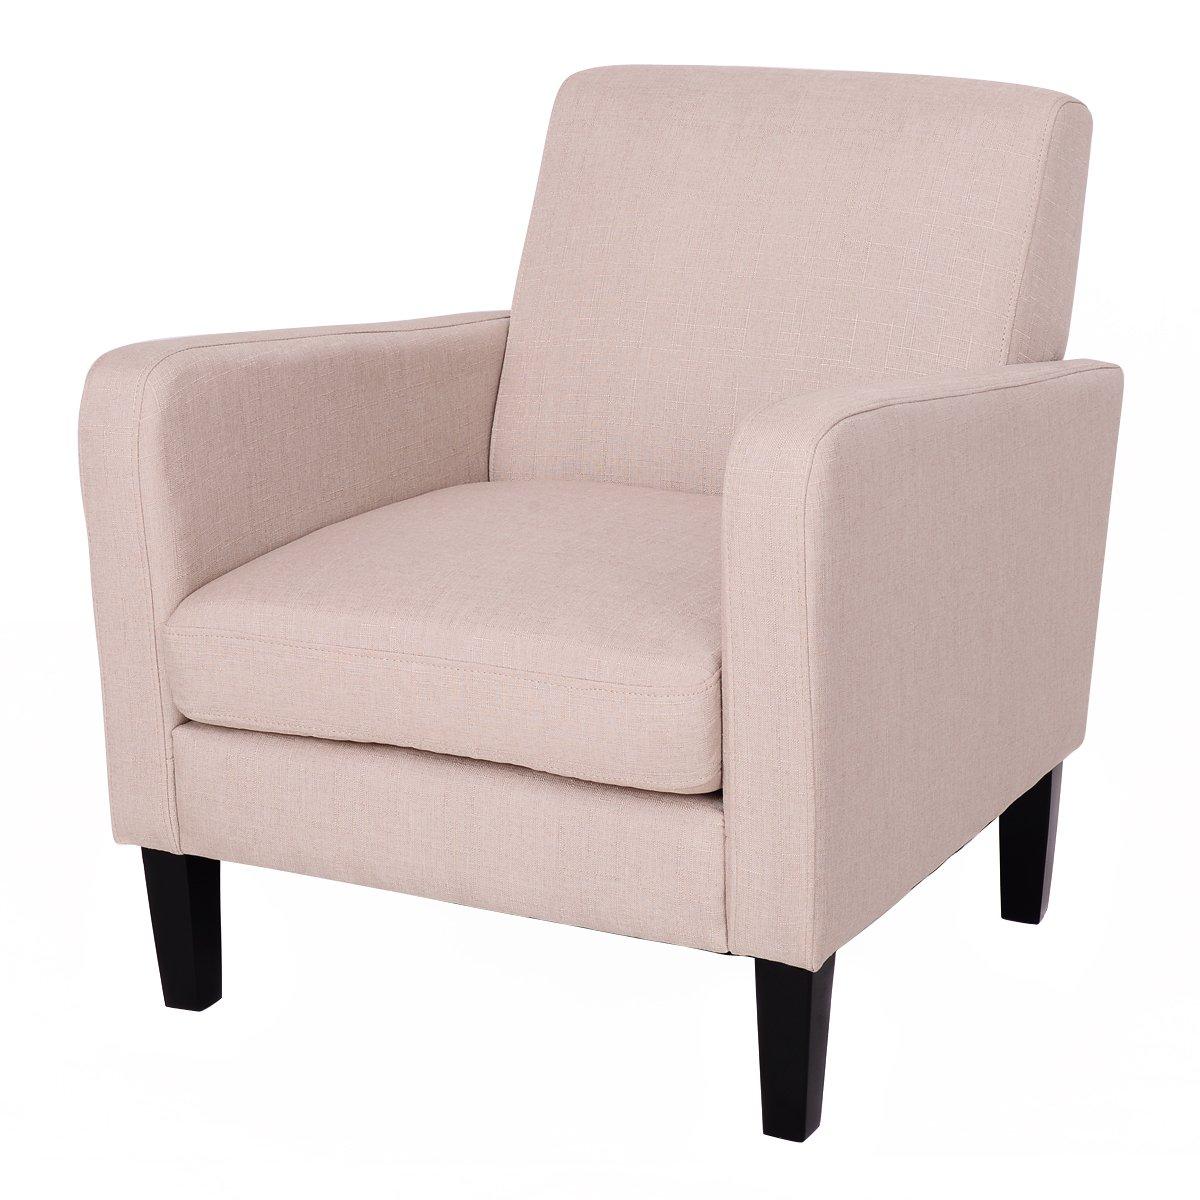 Our Furniture Warehouse - Velltri 2 seater sofa in soft ...